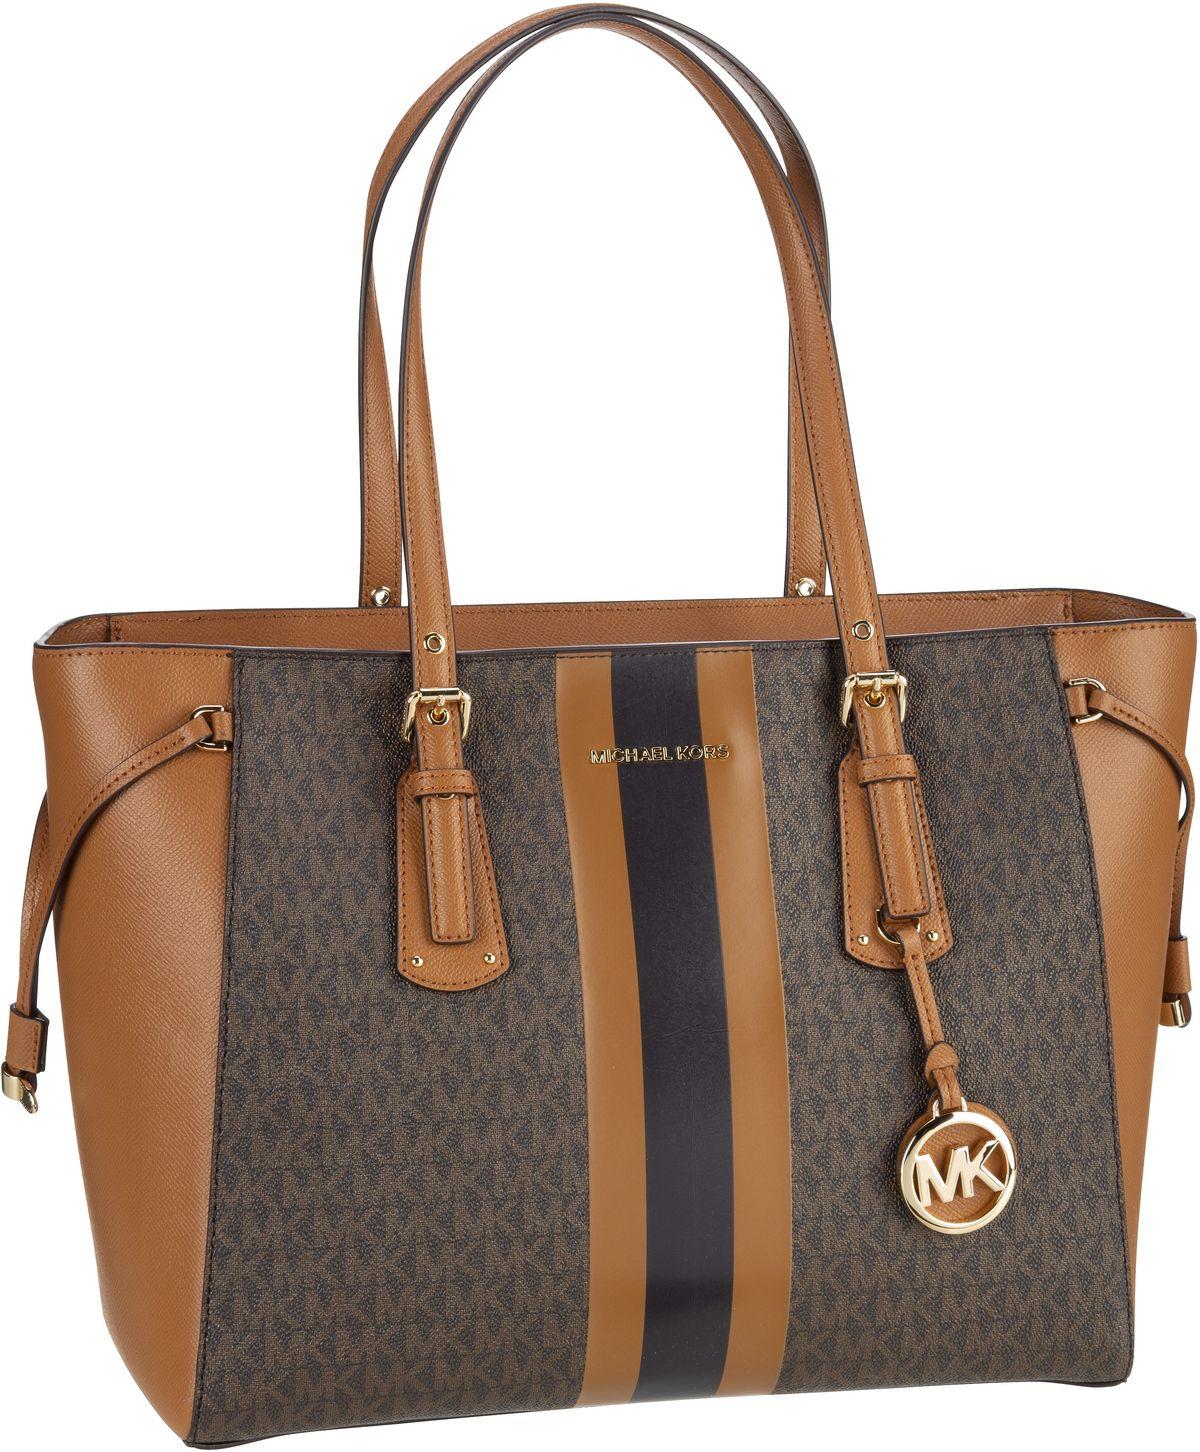 michael kors -  Handtasche Voyager Medium MF TZ Tote MK Signature Stripe Brown/Acorn